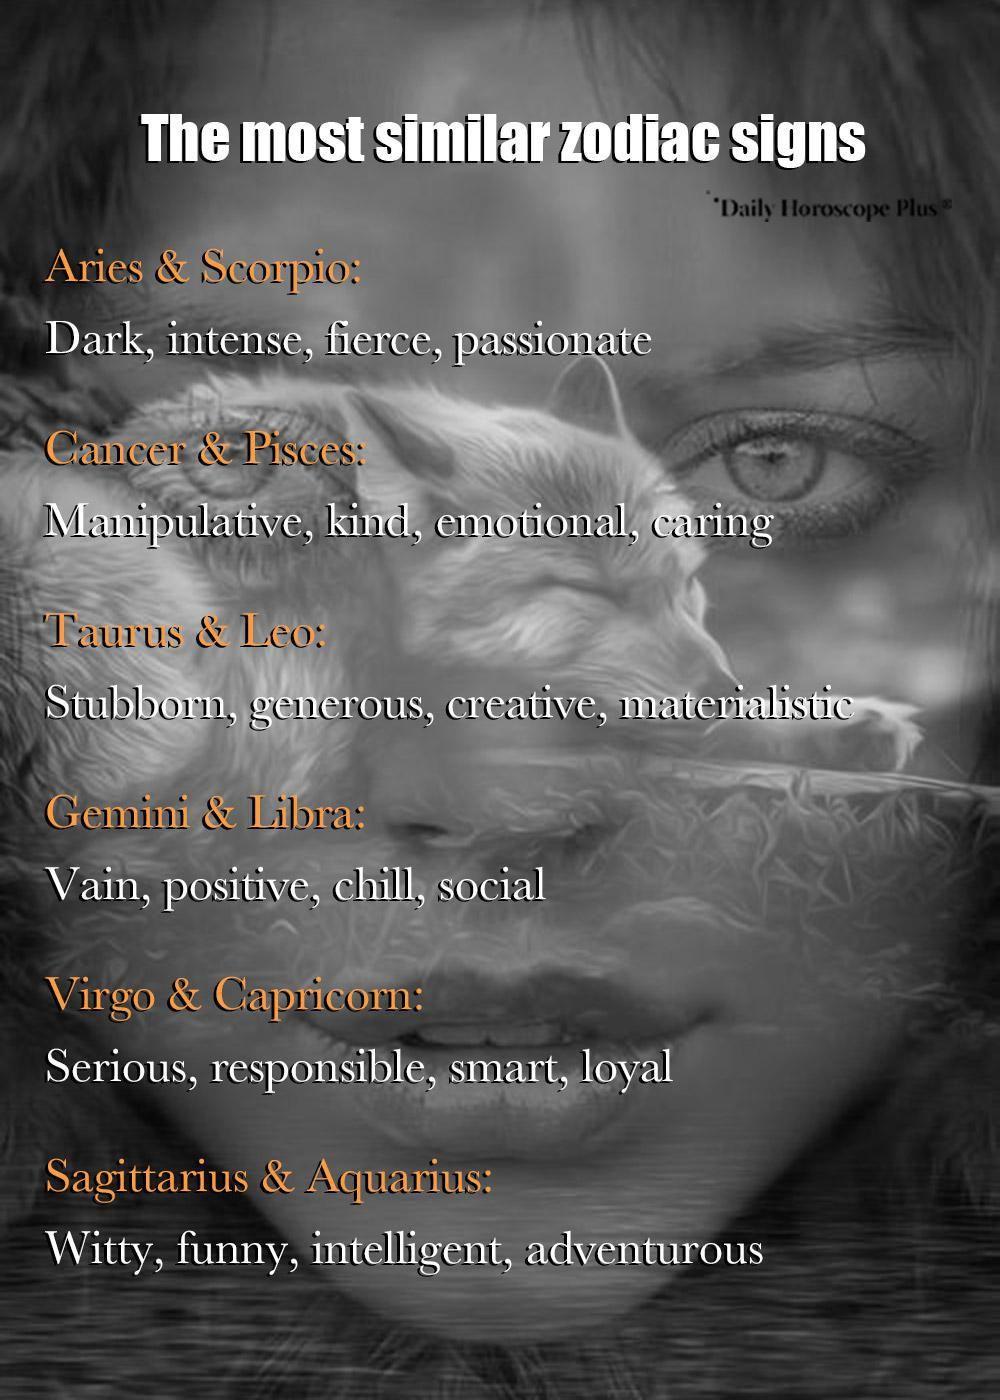 Horoscope Memes Quotes Zodiac Signs Horoscope Zodiac Signs